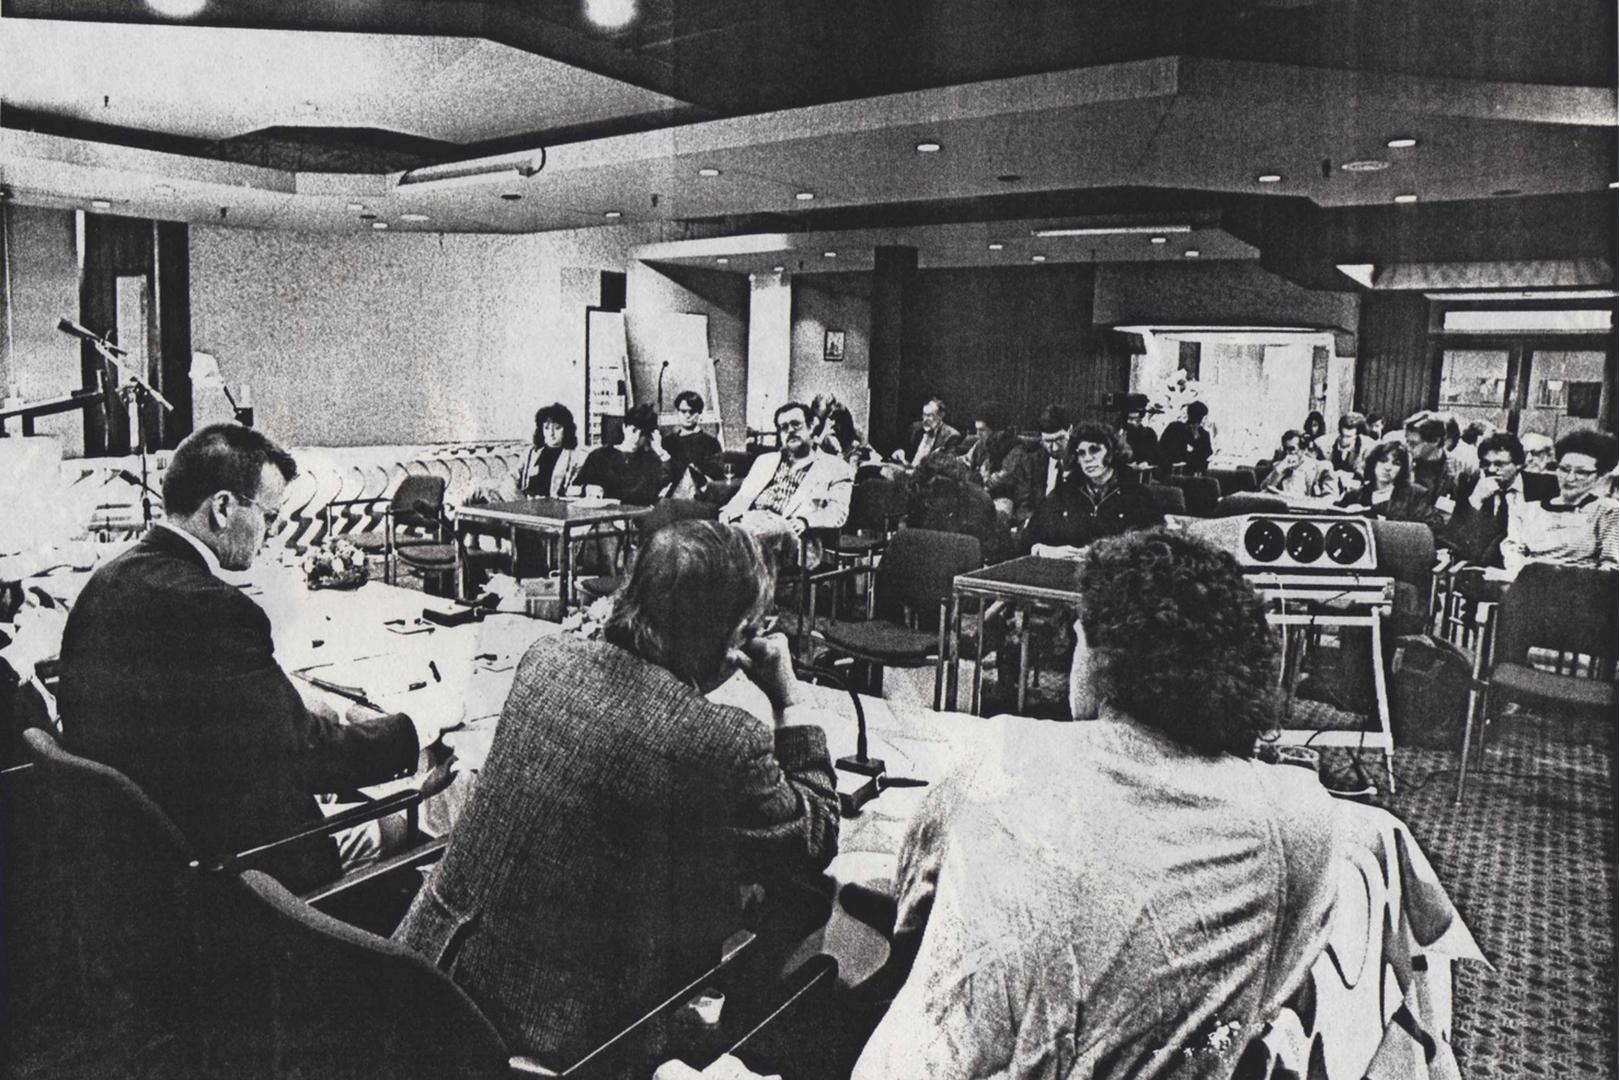 ©FISEA: First International Symposium on Electronic Art, Theo Hesper, Roy Ascott, Jürgen Claus, Roger F. Malina, and Raymond Lauzzana, Founding Meeting Inter-Society for the Electronic Arts